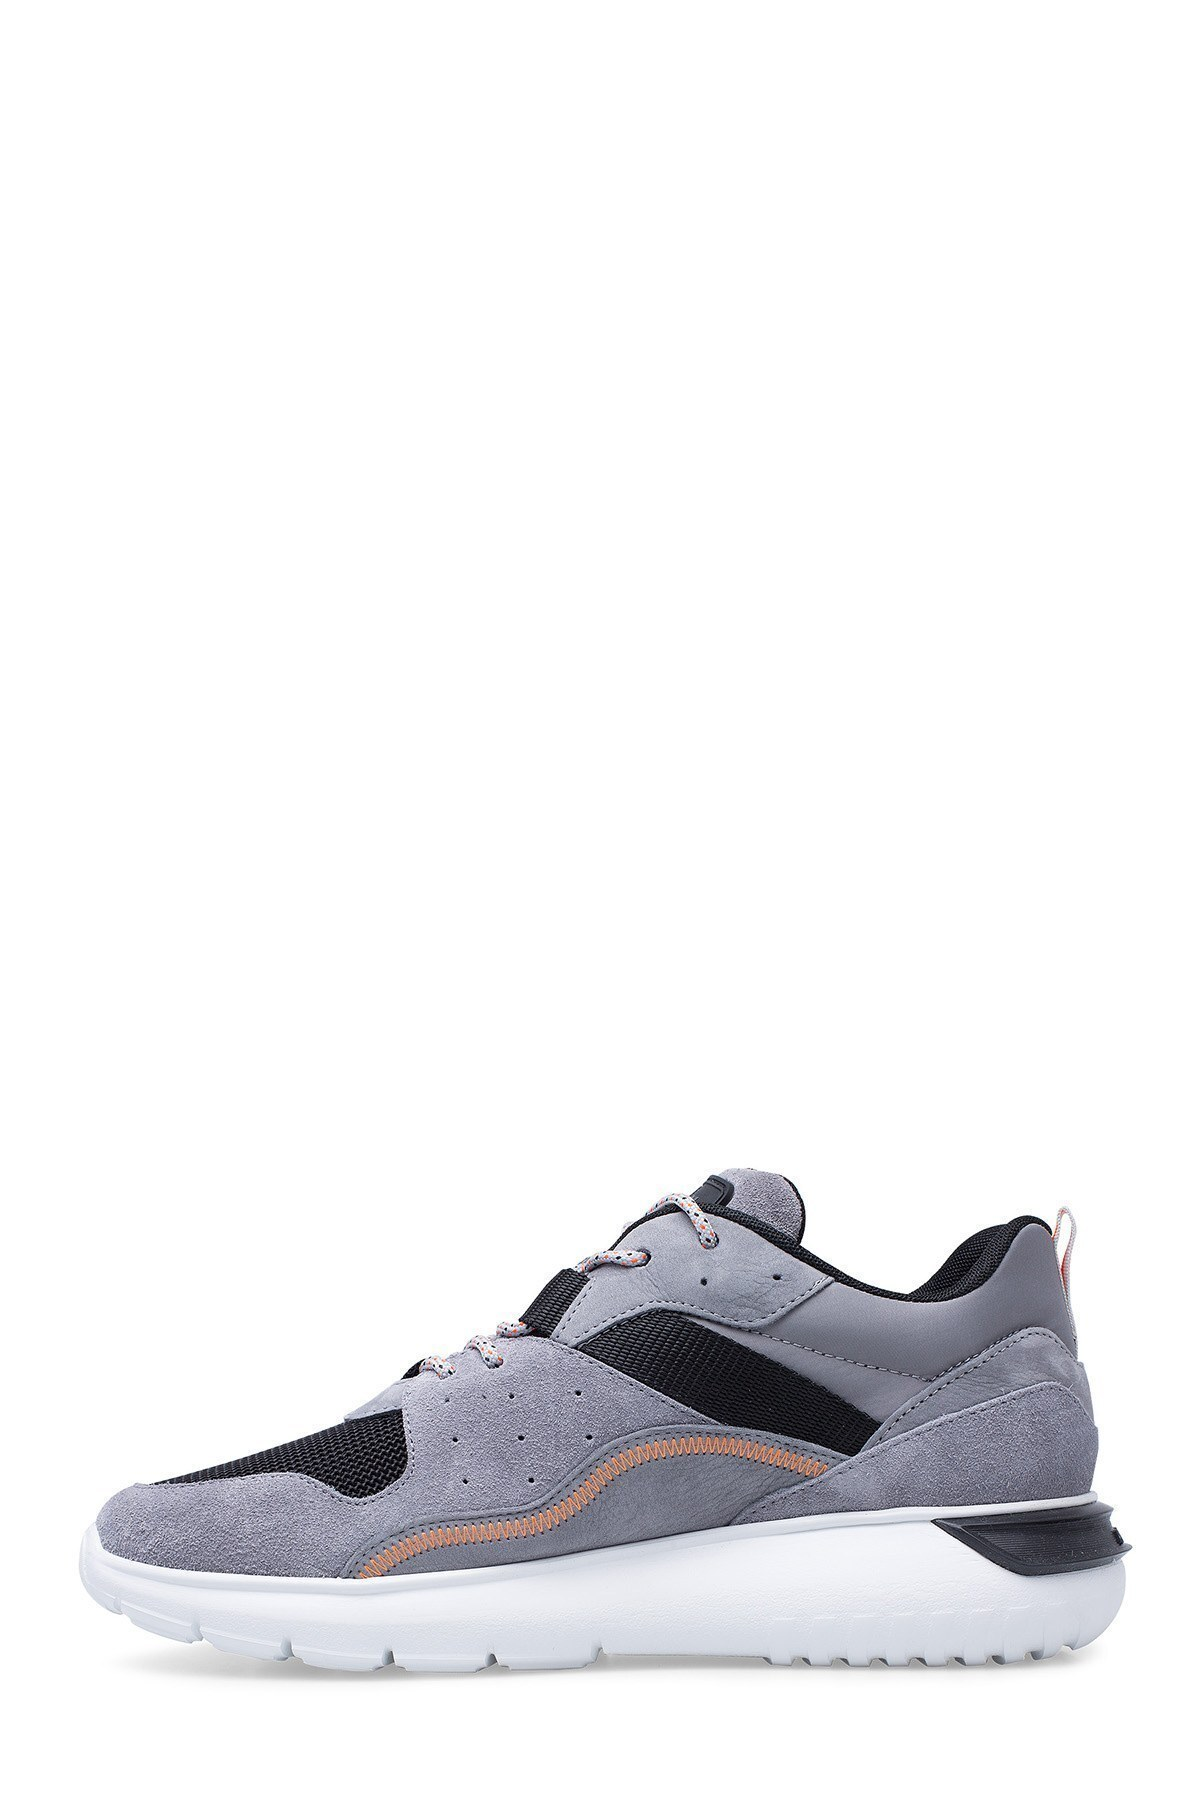 Hogan Erkek Ayakkabı HXM5190AQ14NUC9480 GRİ